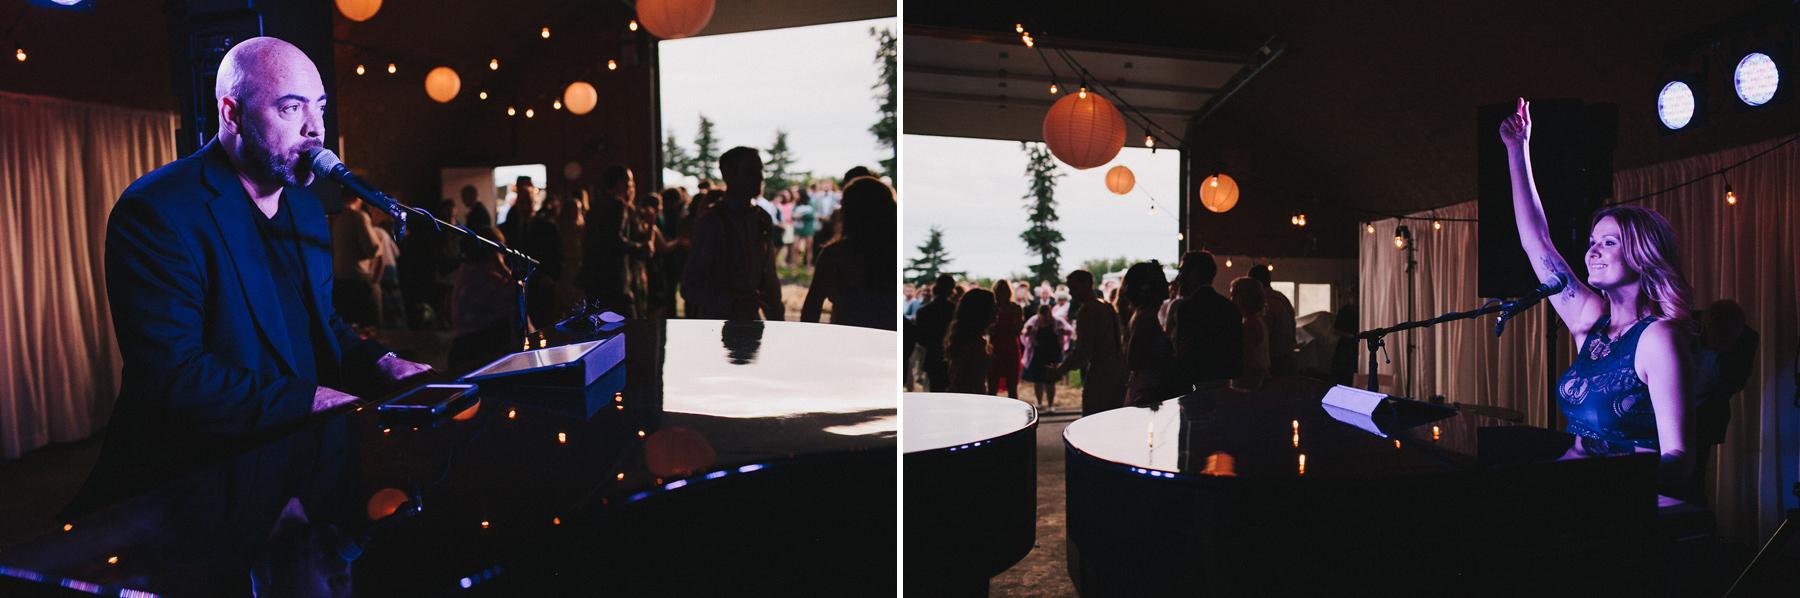 alberta-farm-wedding-photographer-rp-wj-244.jpg